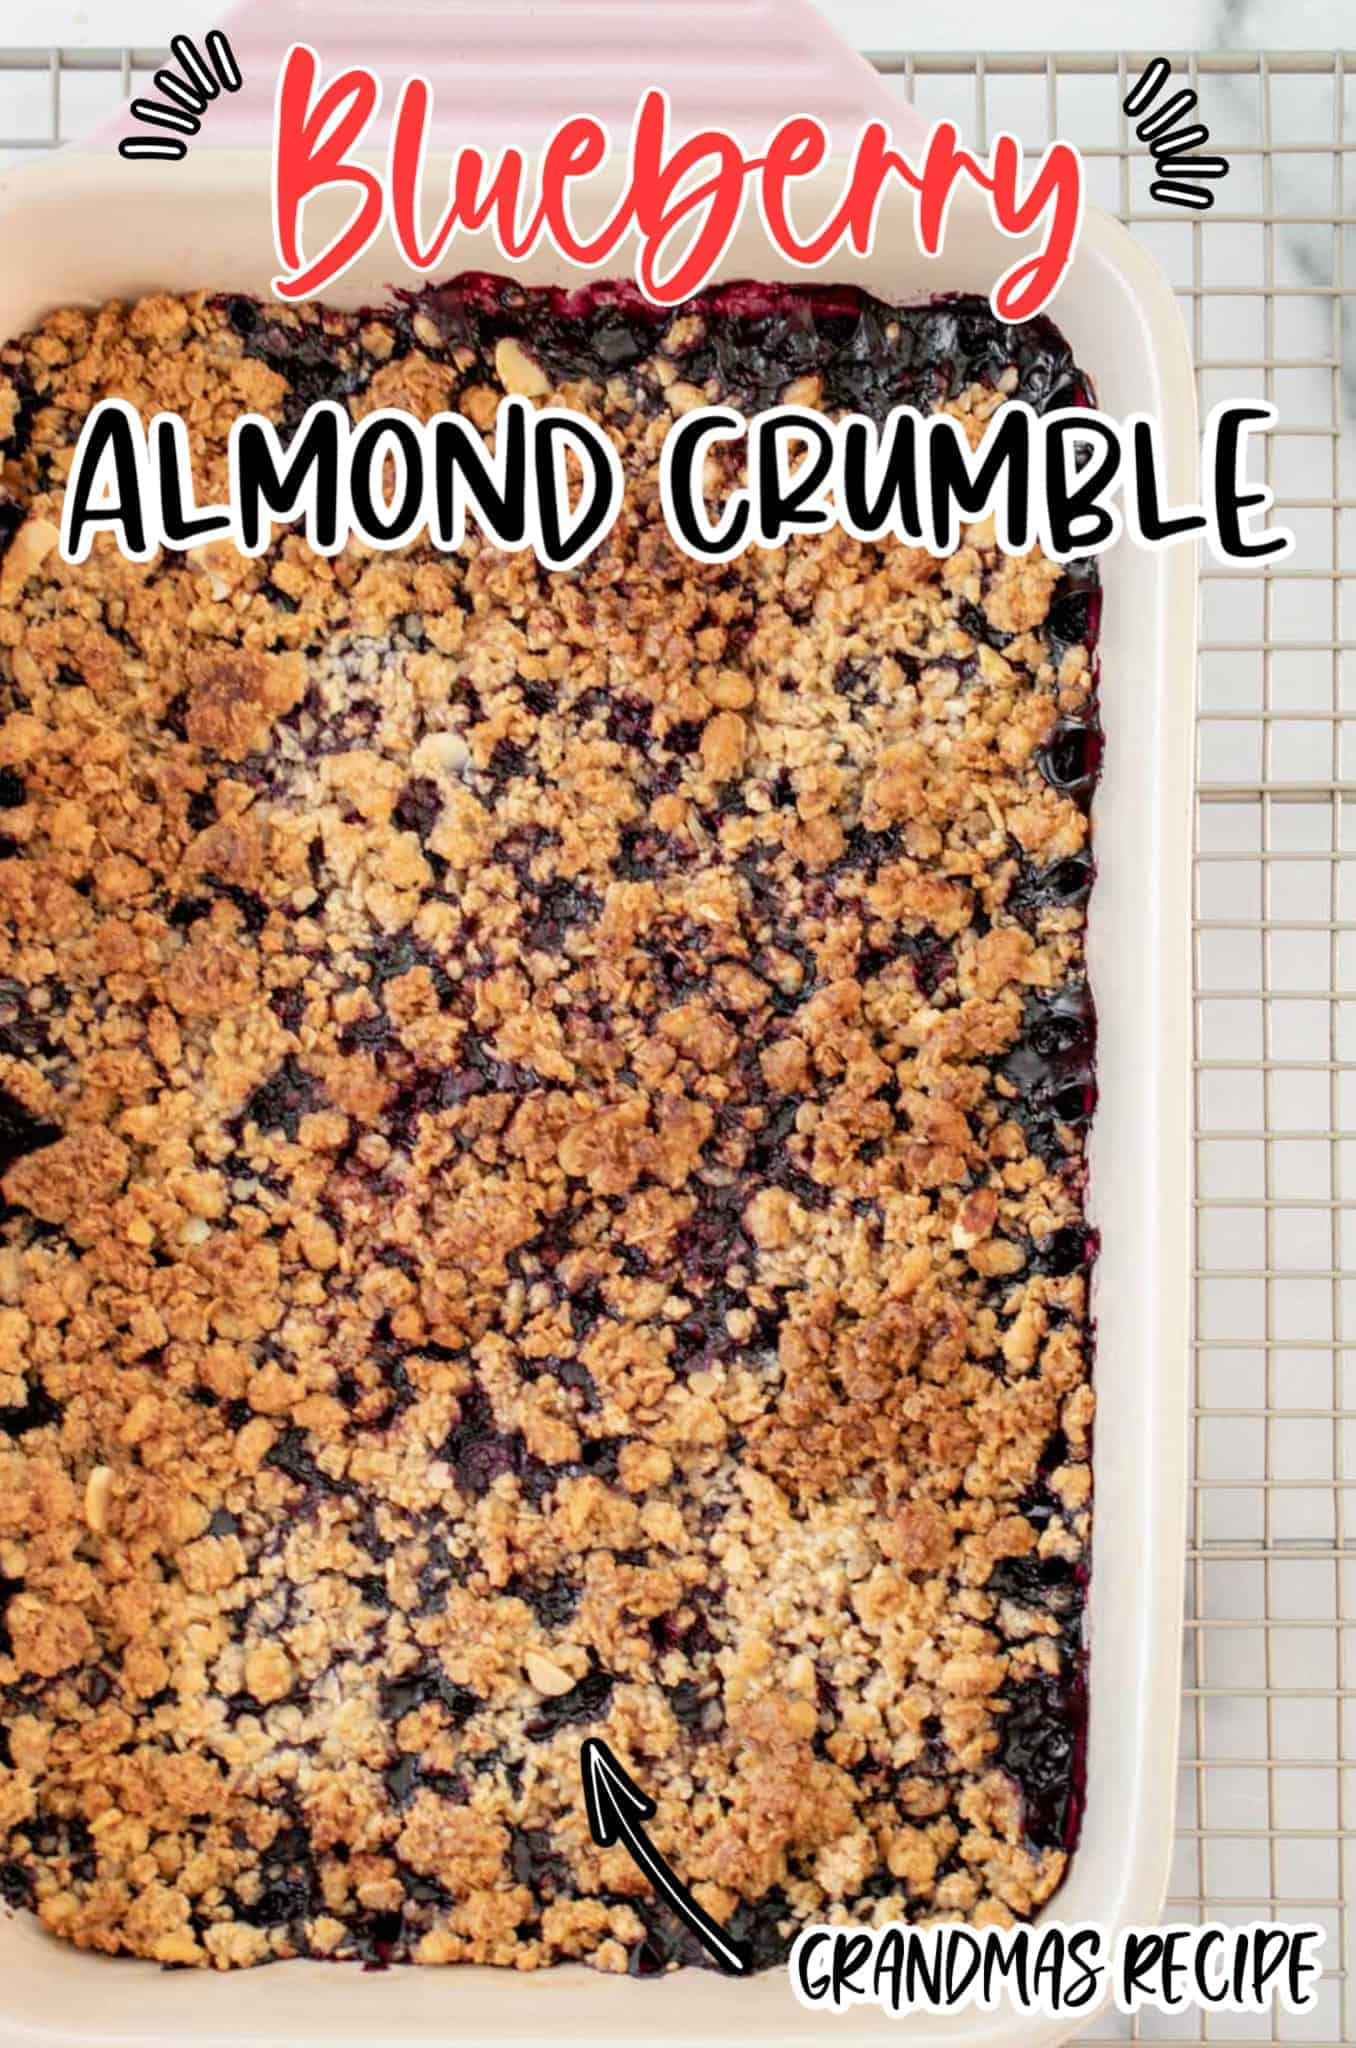 Blueberry Almond Crumble